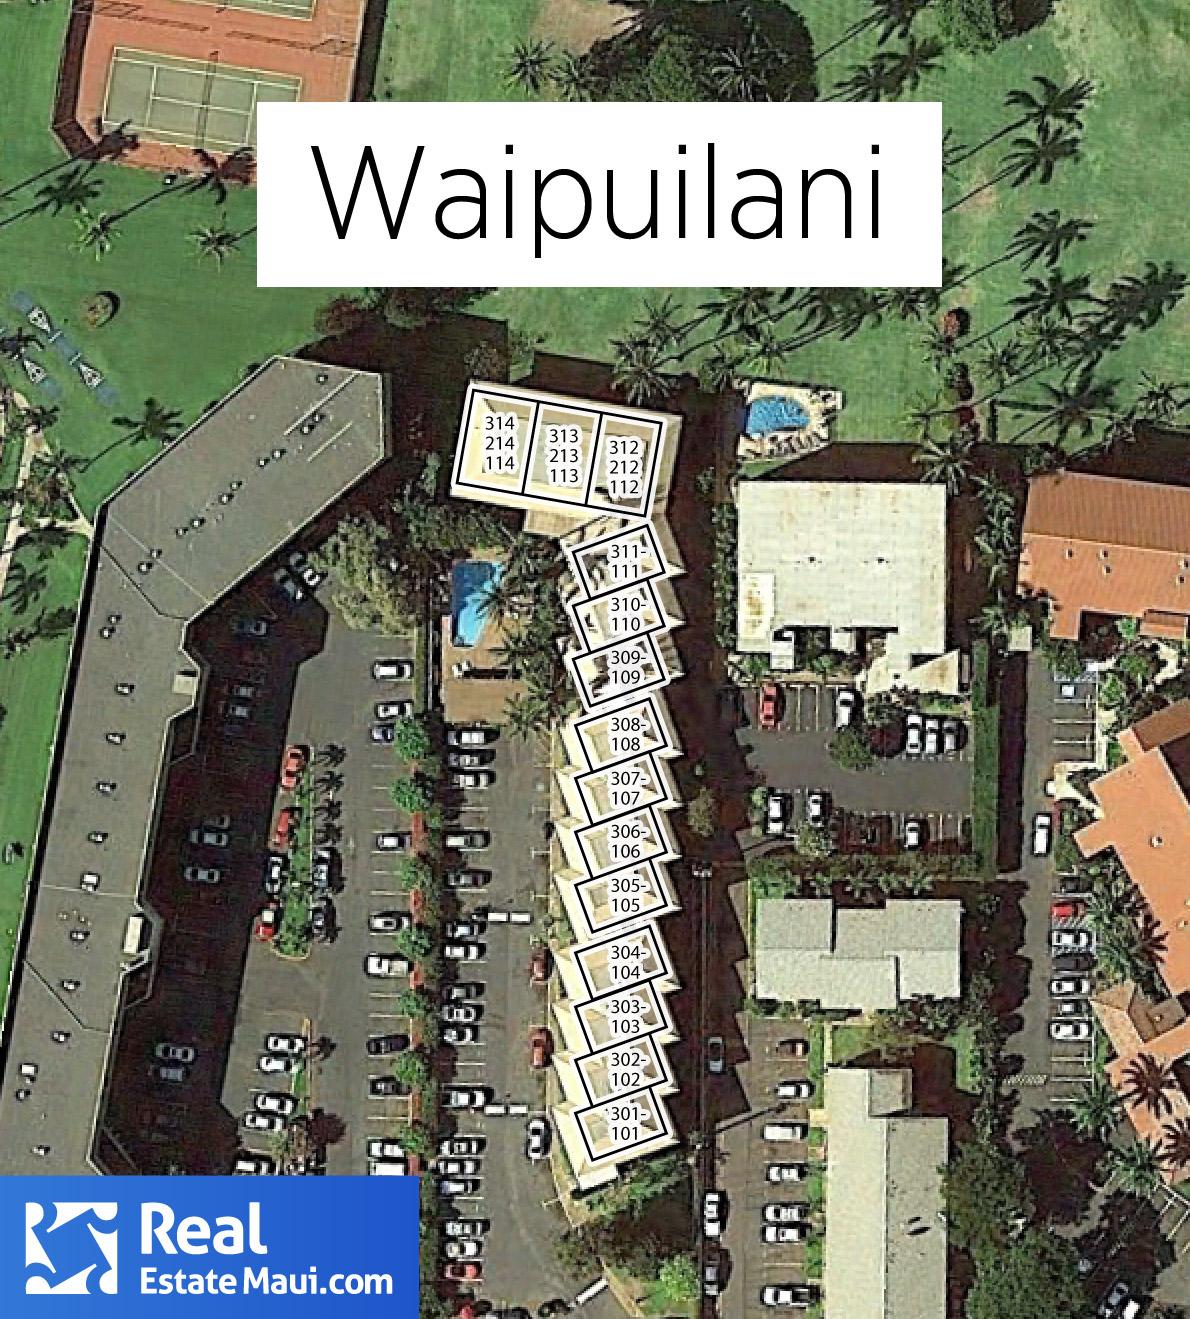 waipuilani condo map